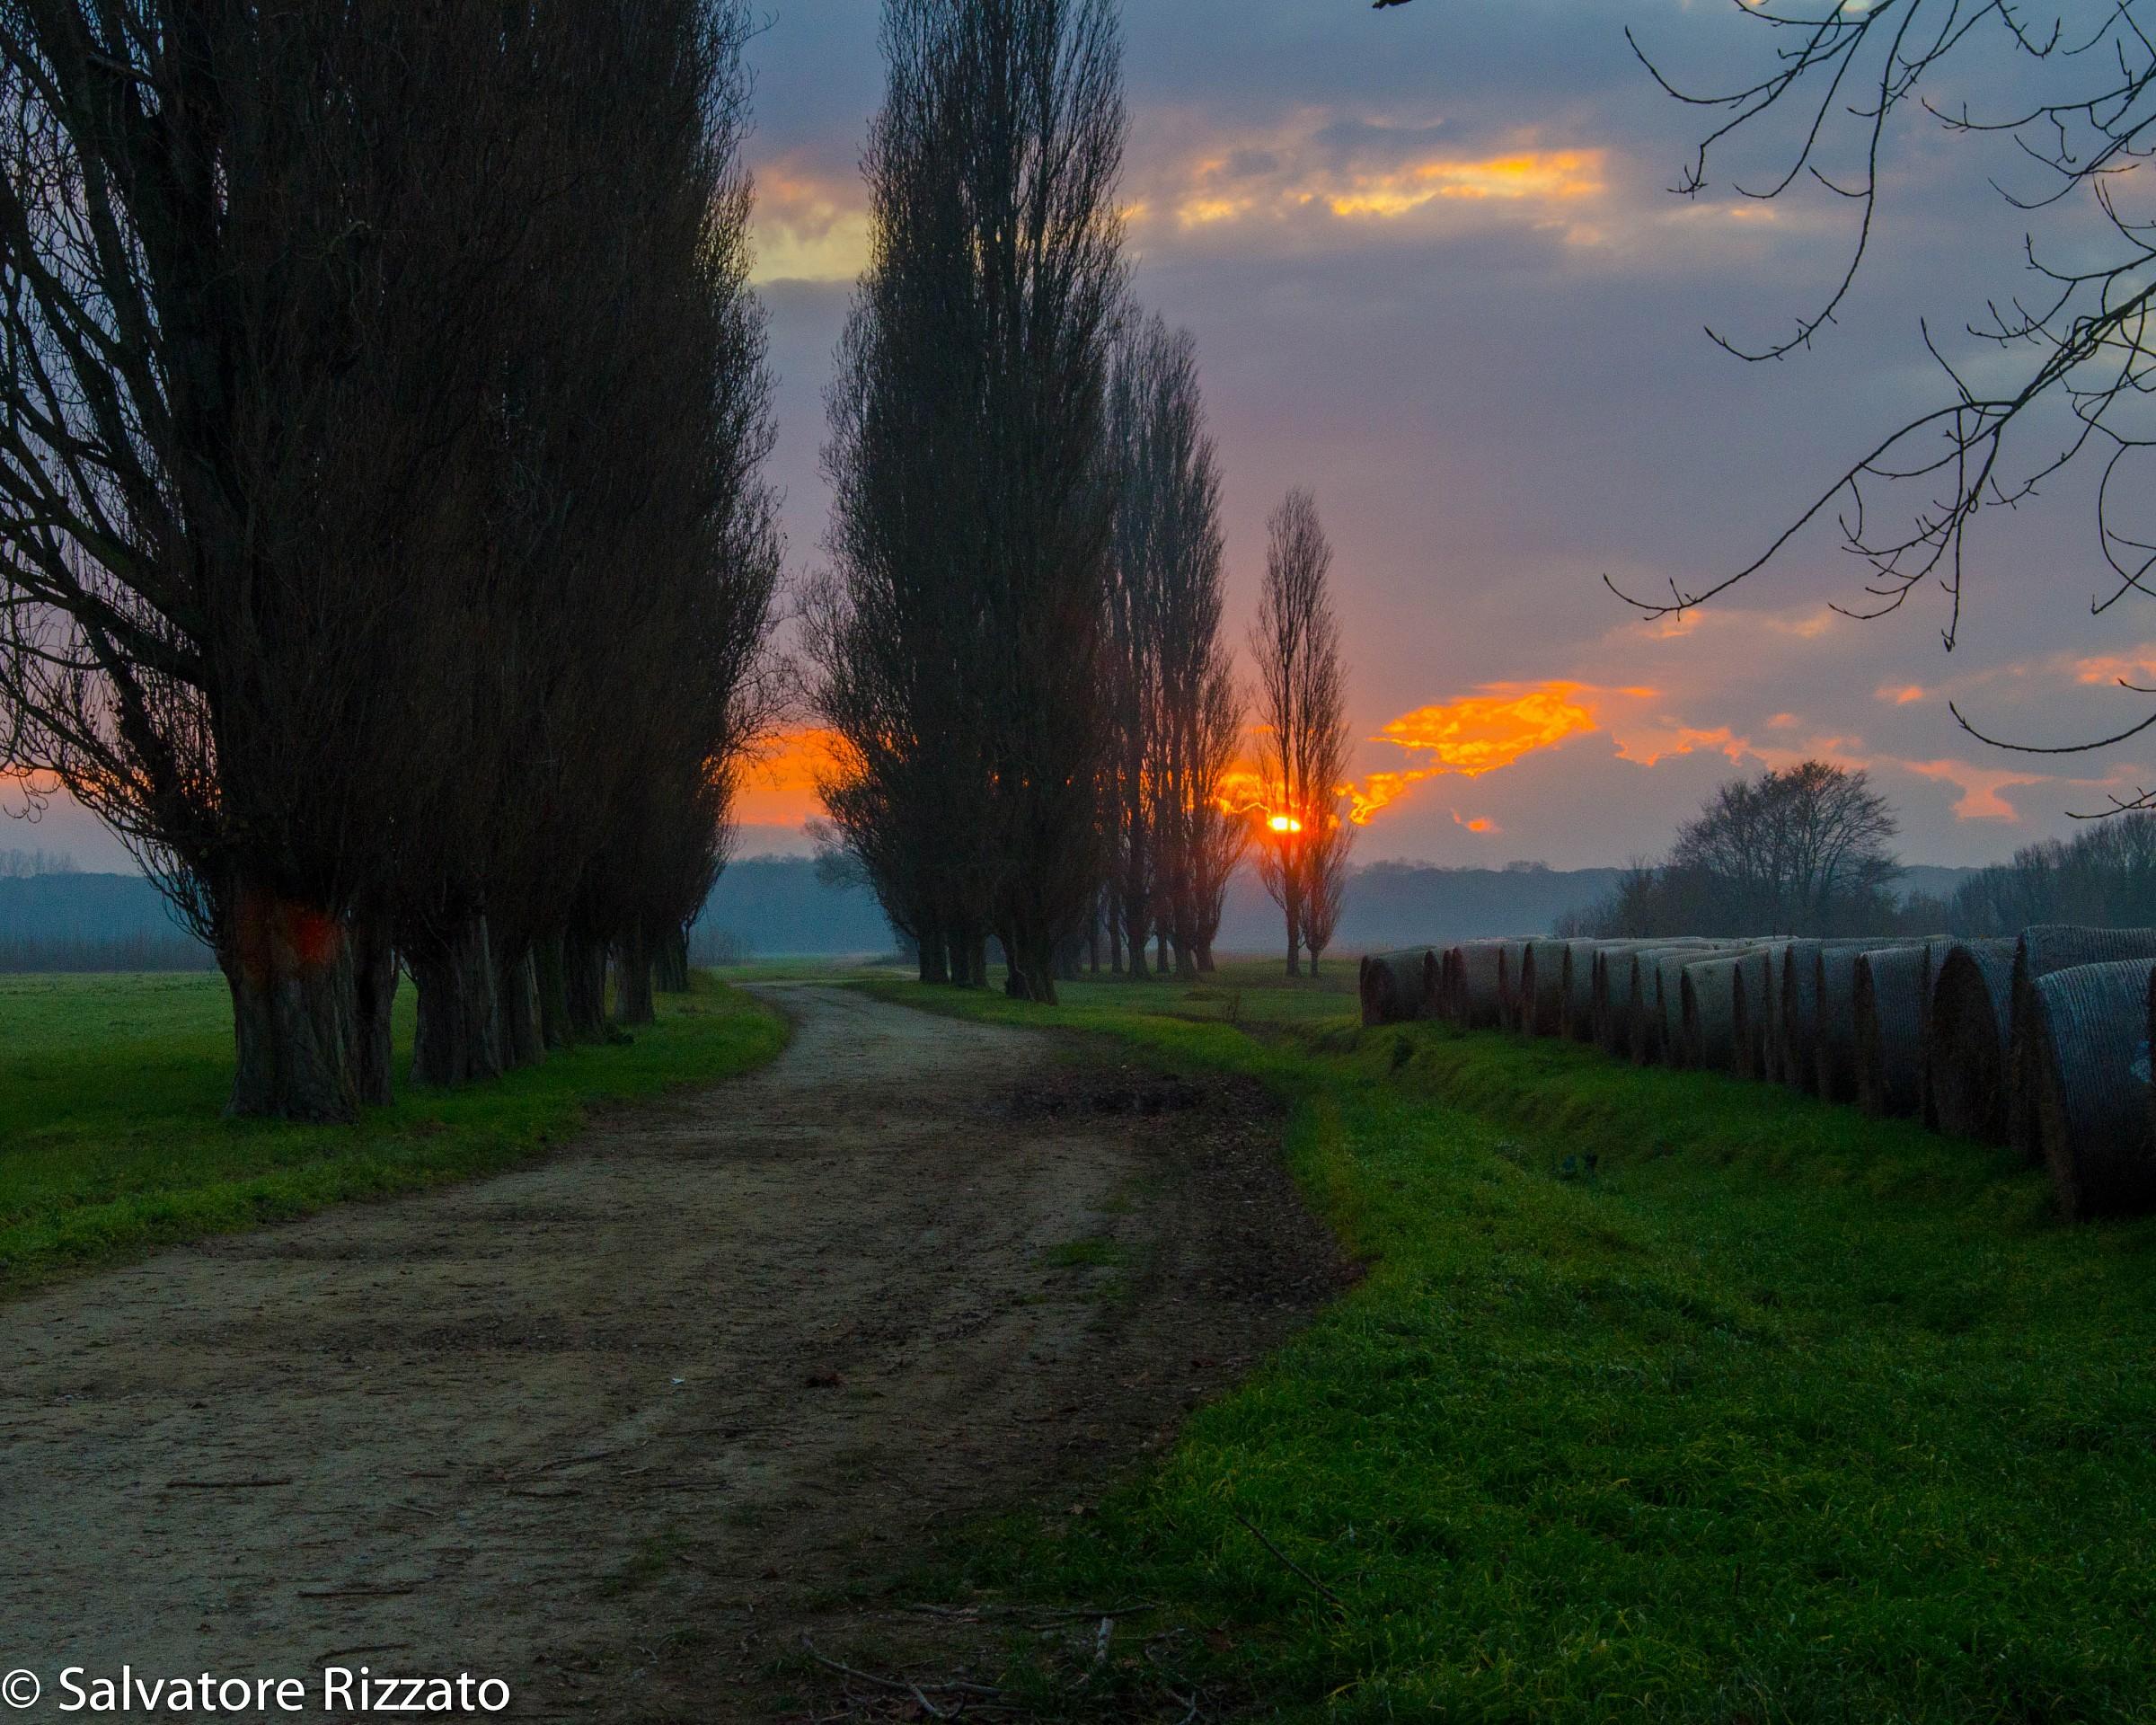 Sunset at St. Piero a Grado...